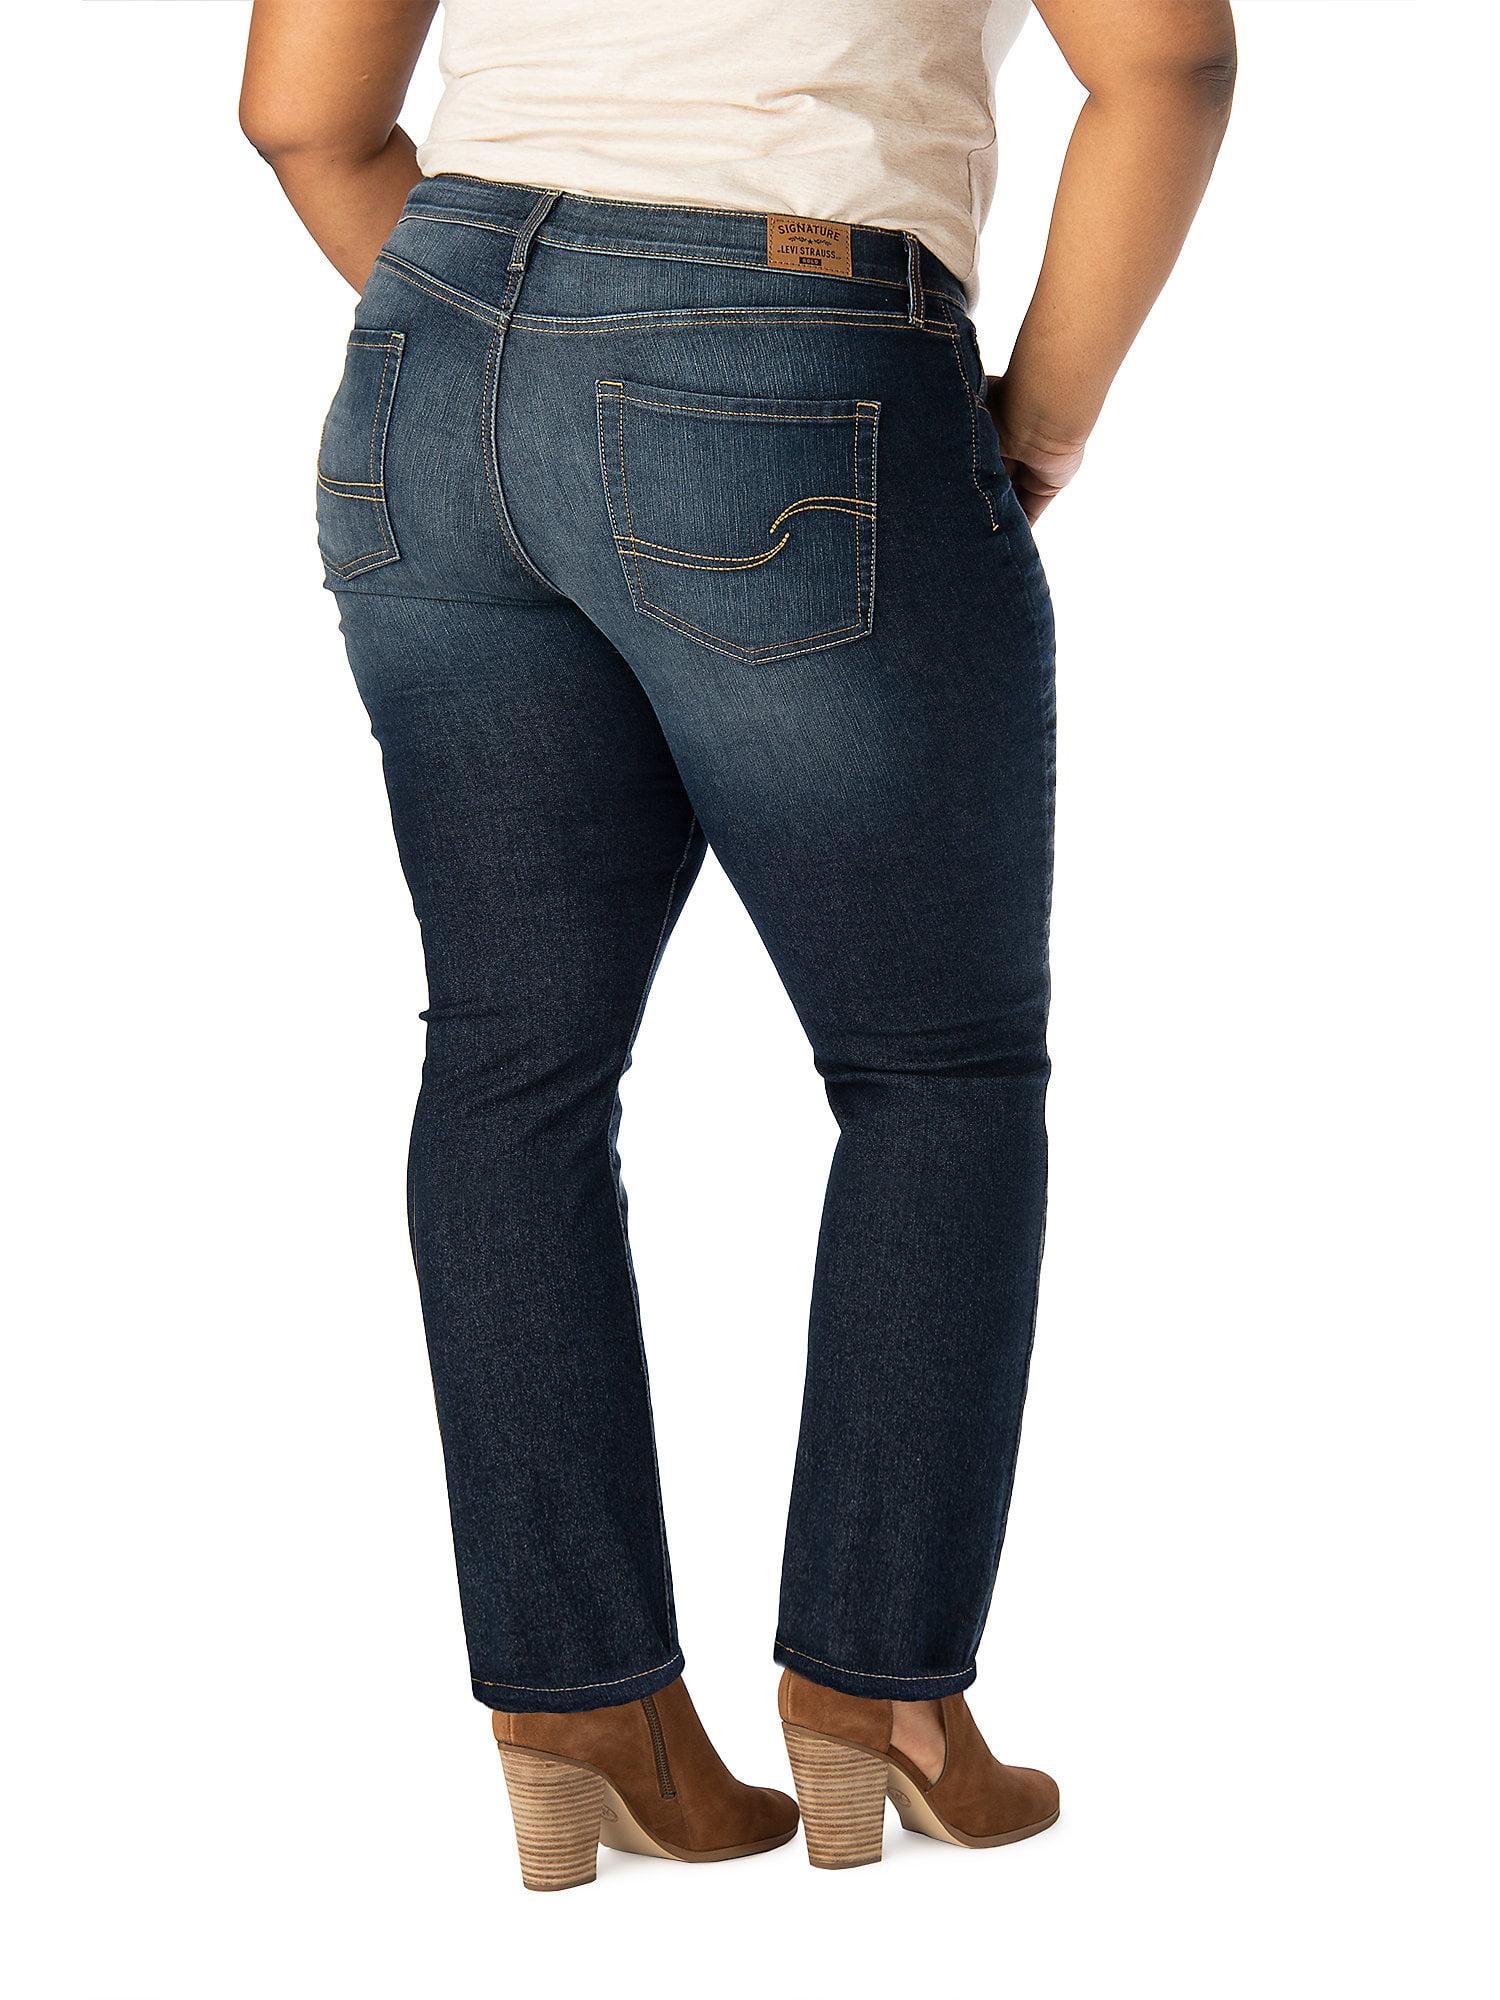 b94d6cee Signature by Levi Strauss & Co. Women's Modern Straight Jeans - Walmart.com